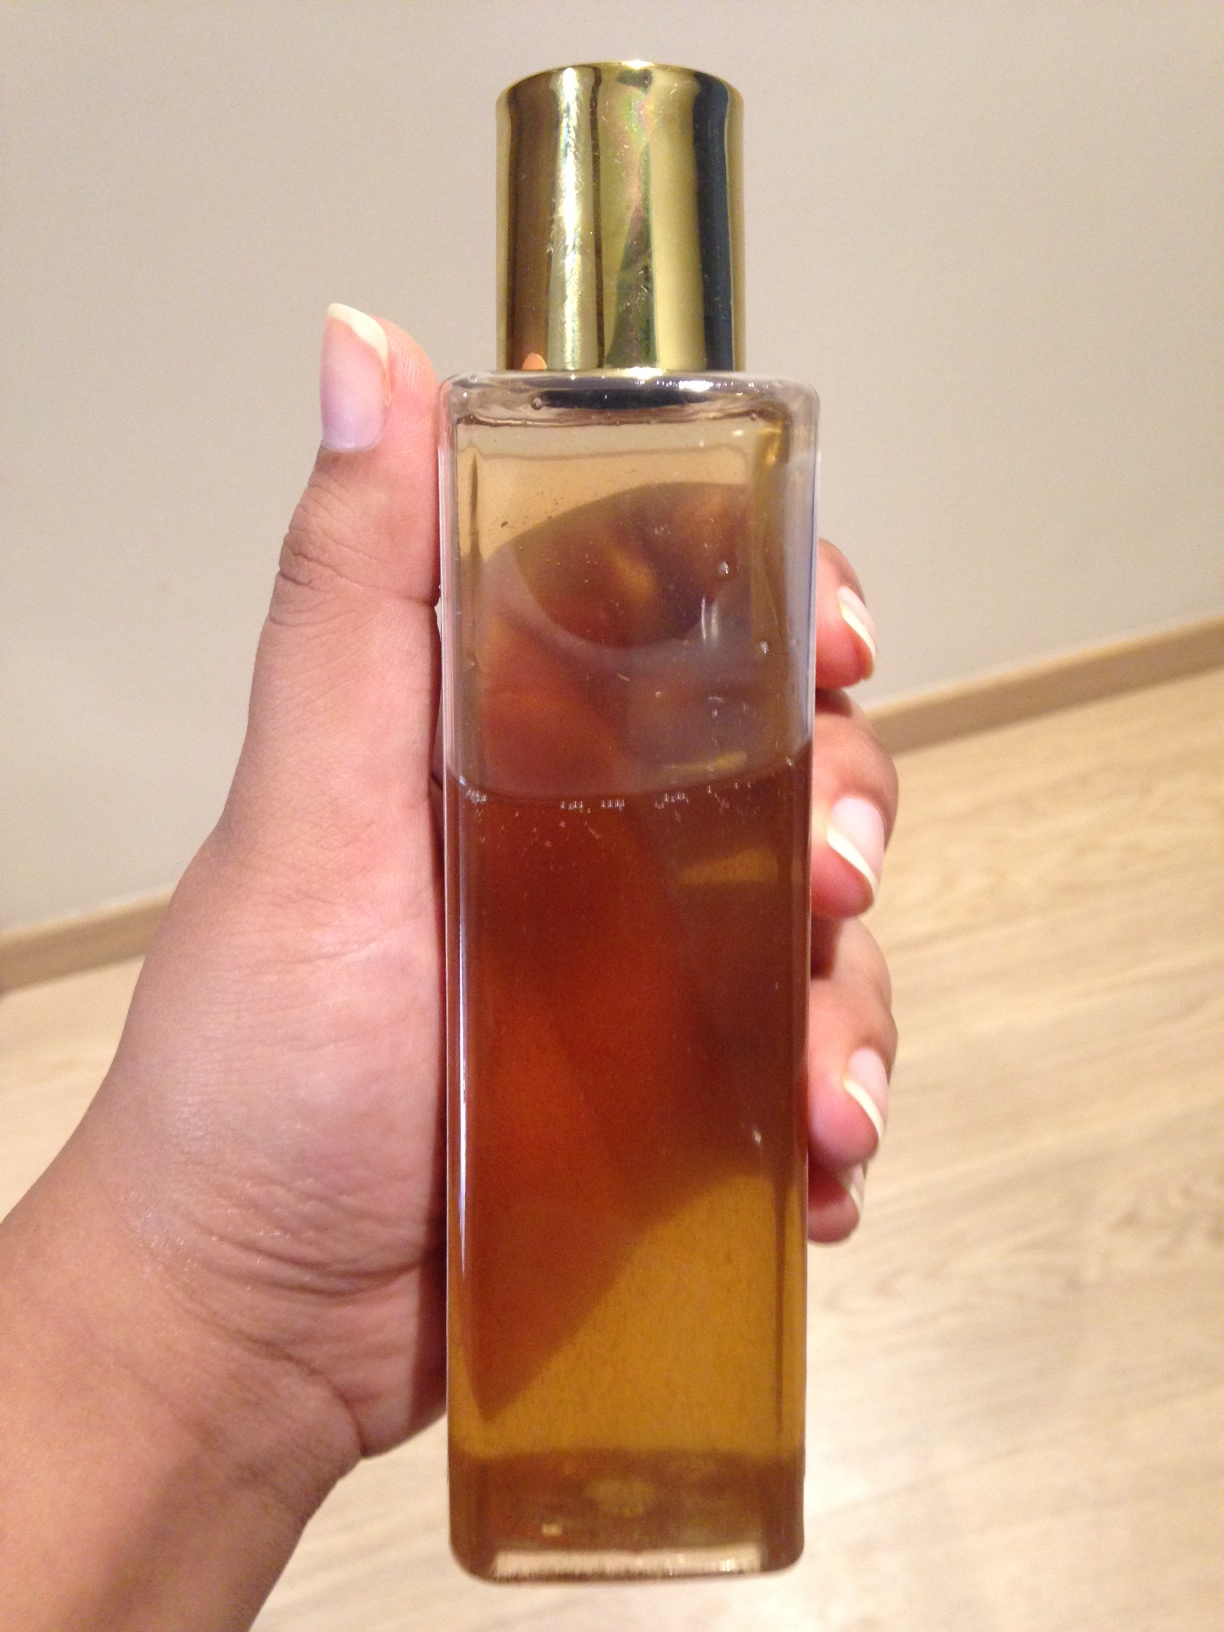 amla-oil-tpw-01.JPG